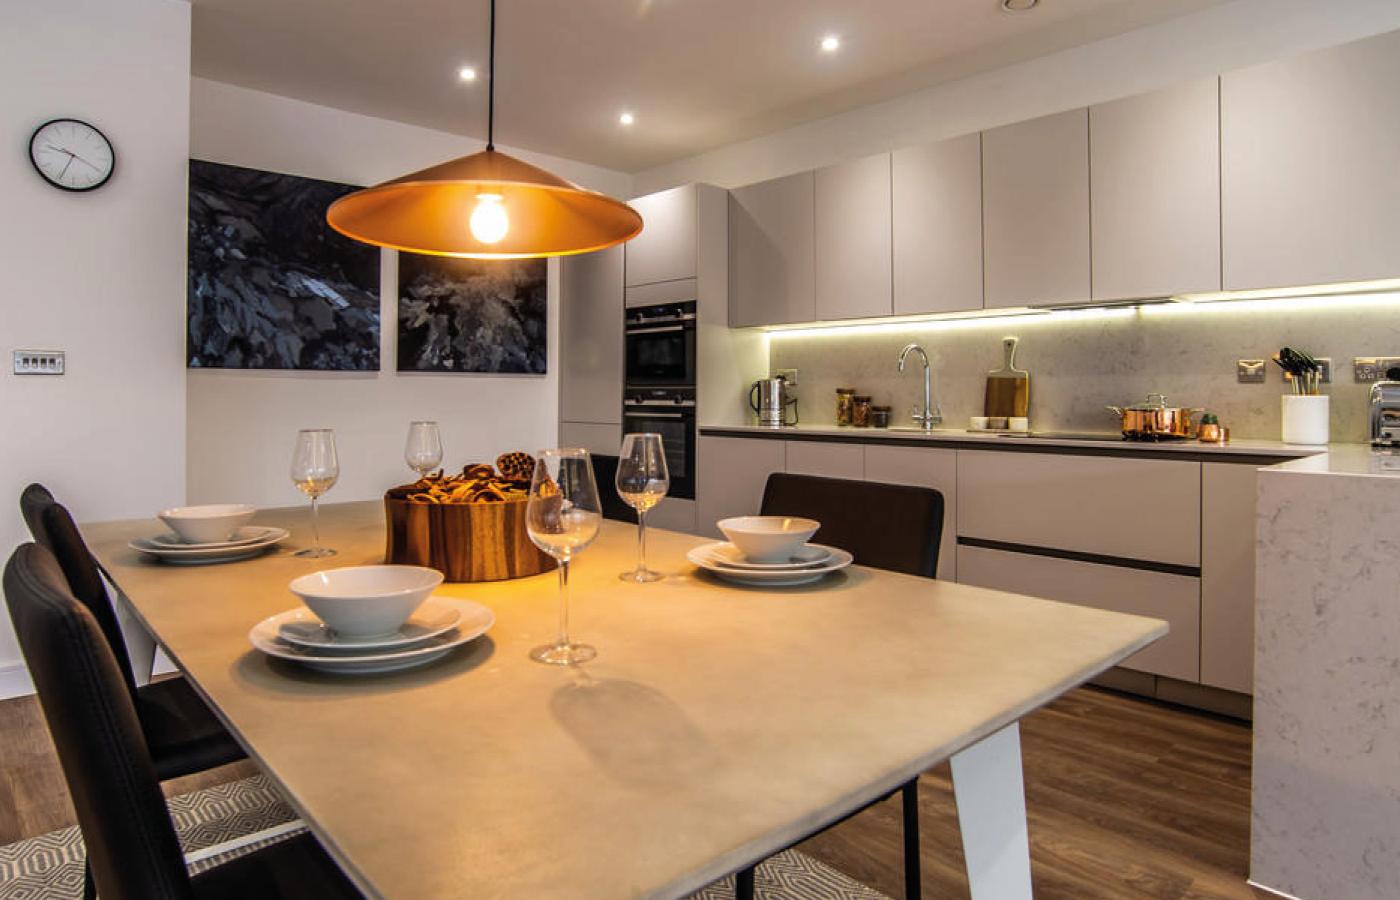 luxury waterside apartments nottingham kitchen diner